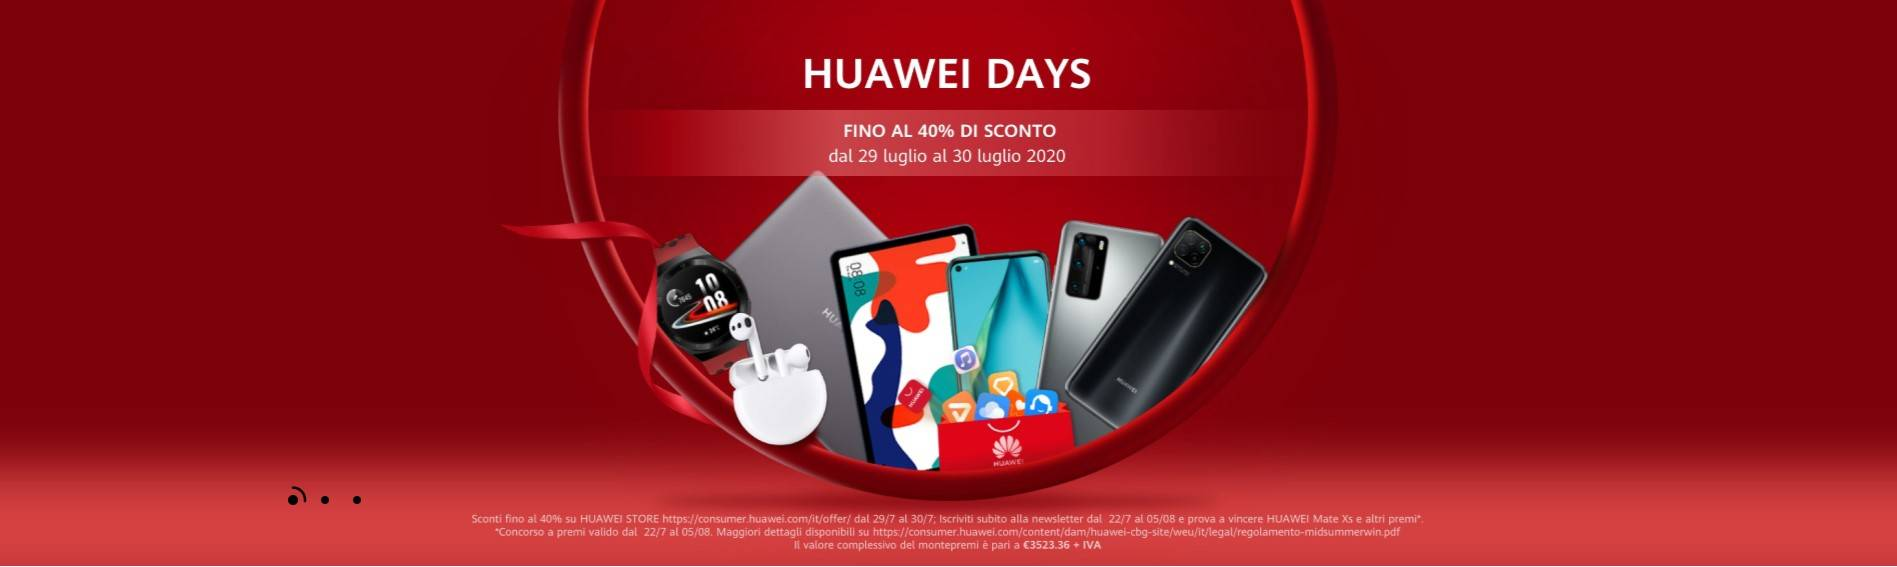 huawei_days_offerte